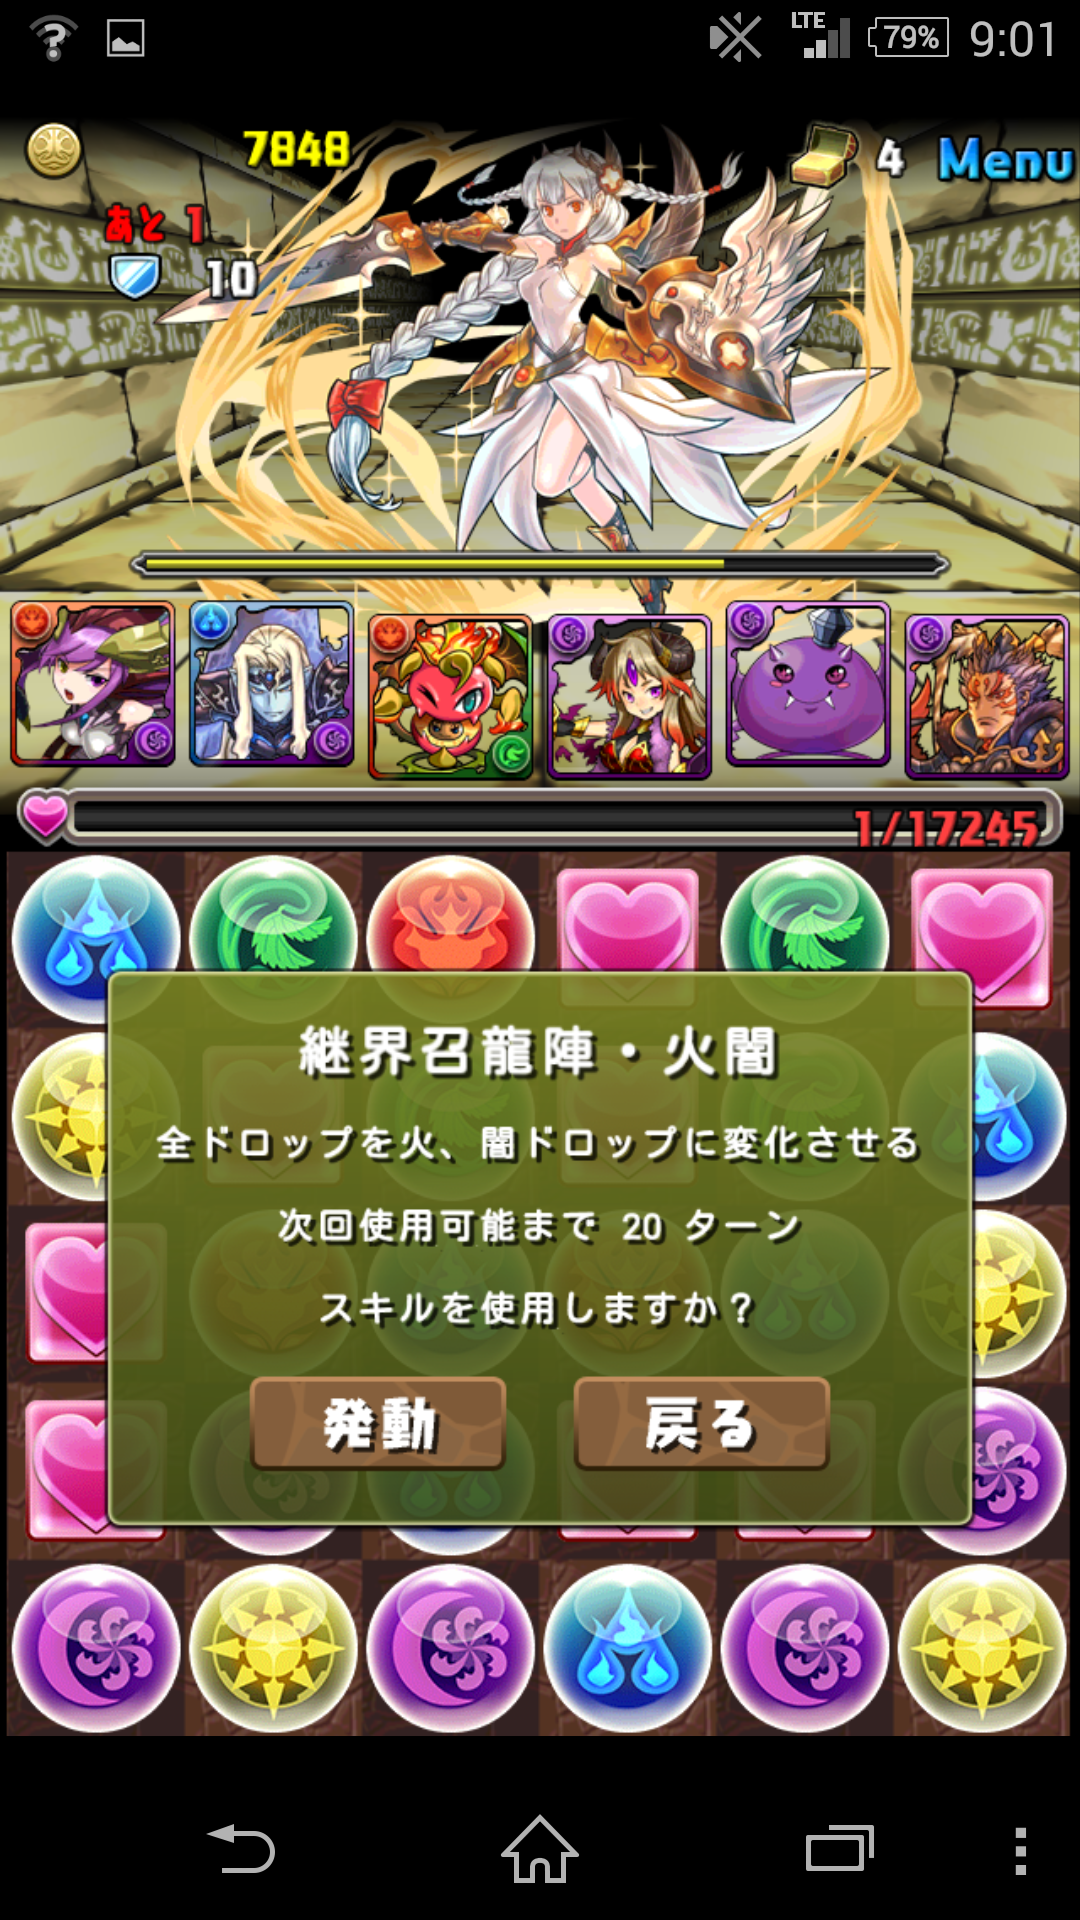 Screenshot_2014-11-15-09-01-22.png